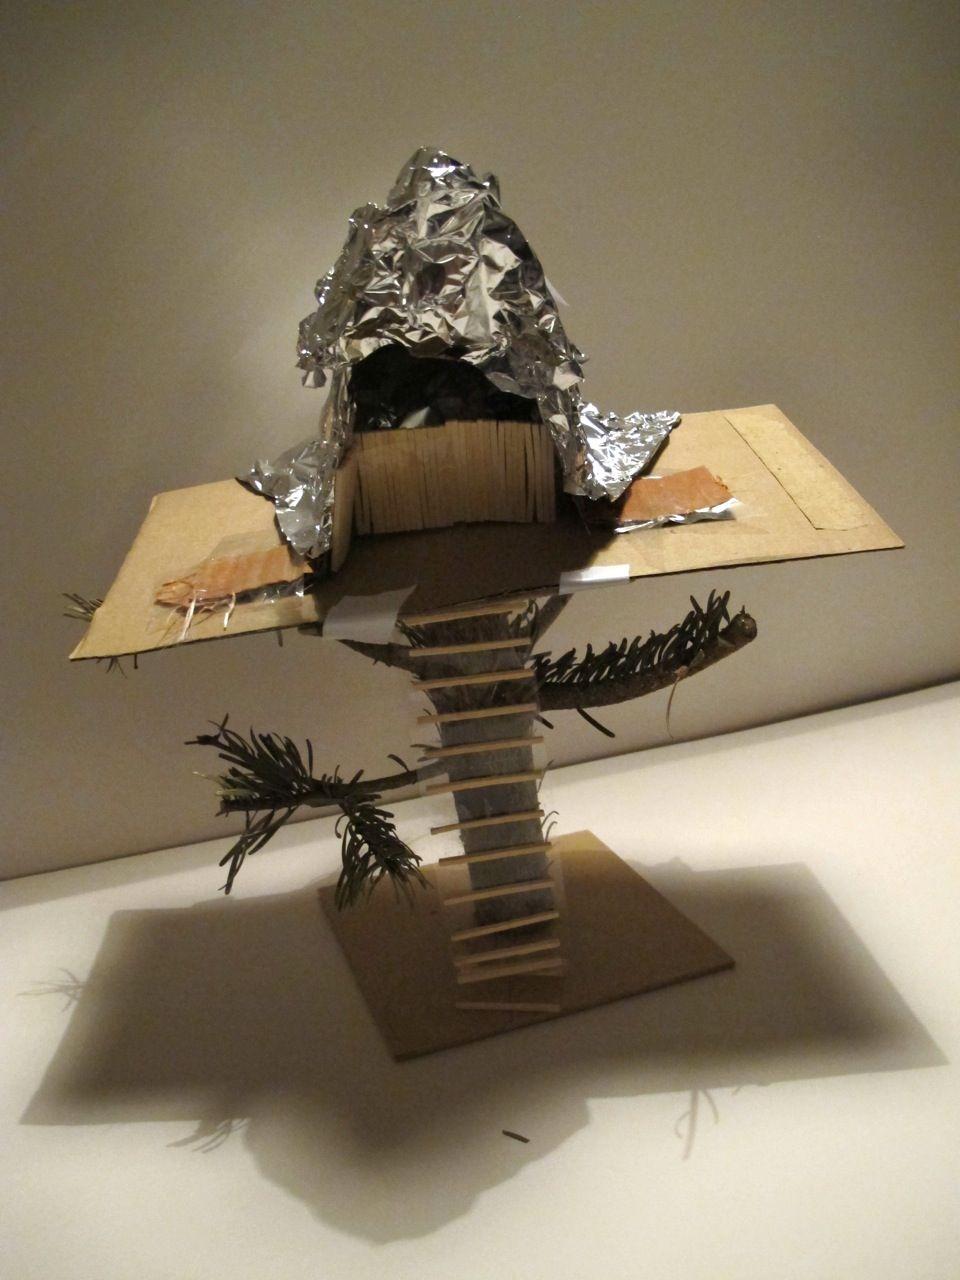 Making a tree house model